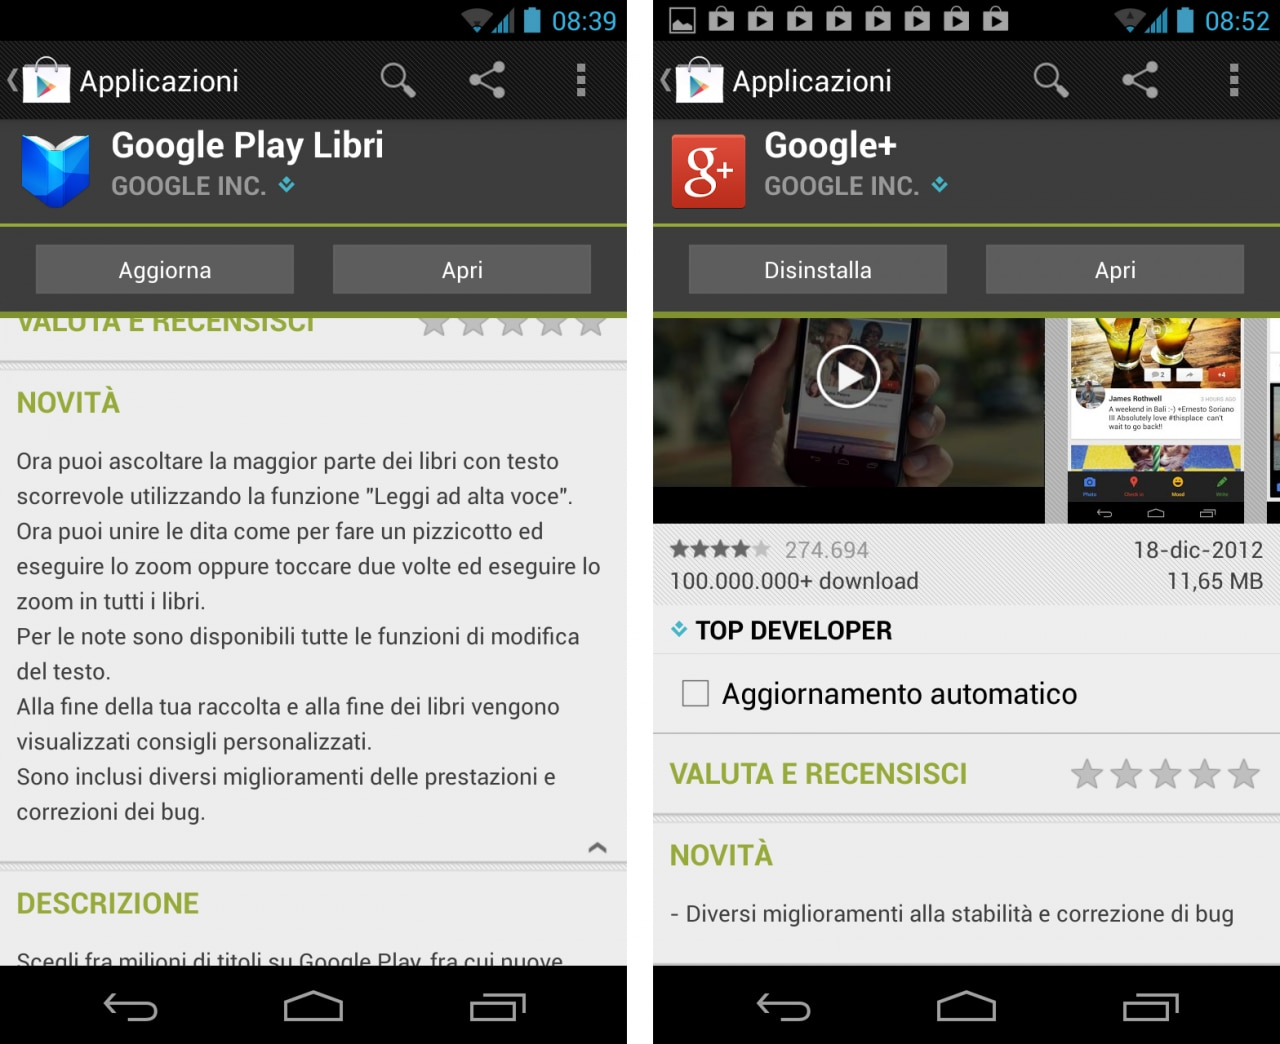 Screenshot_2012-12-19-08-52-32